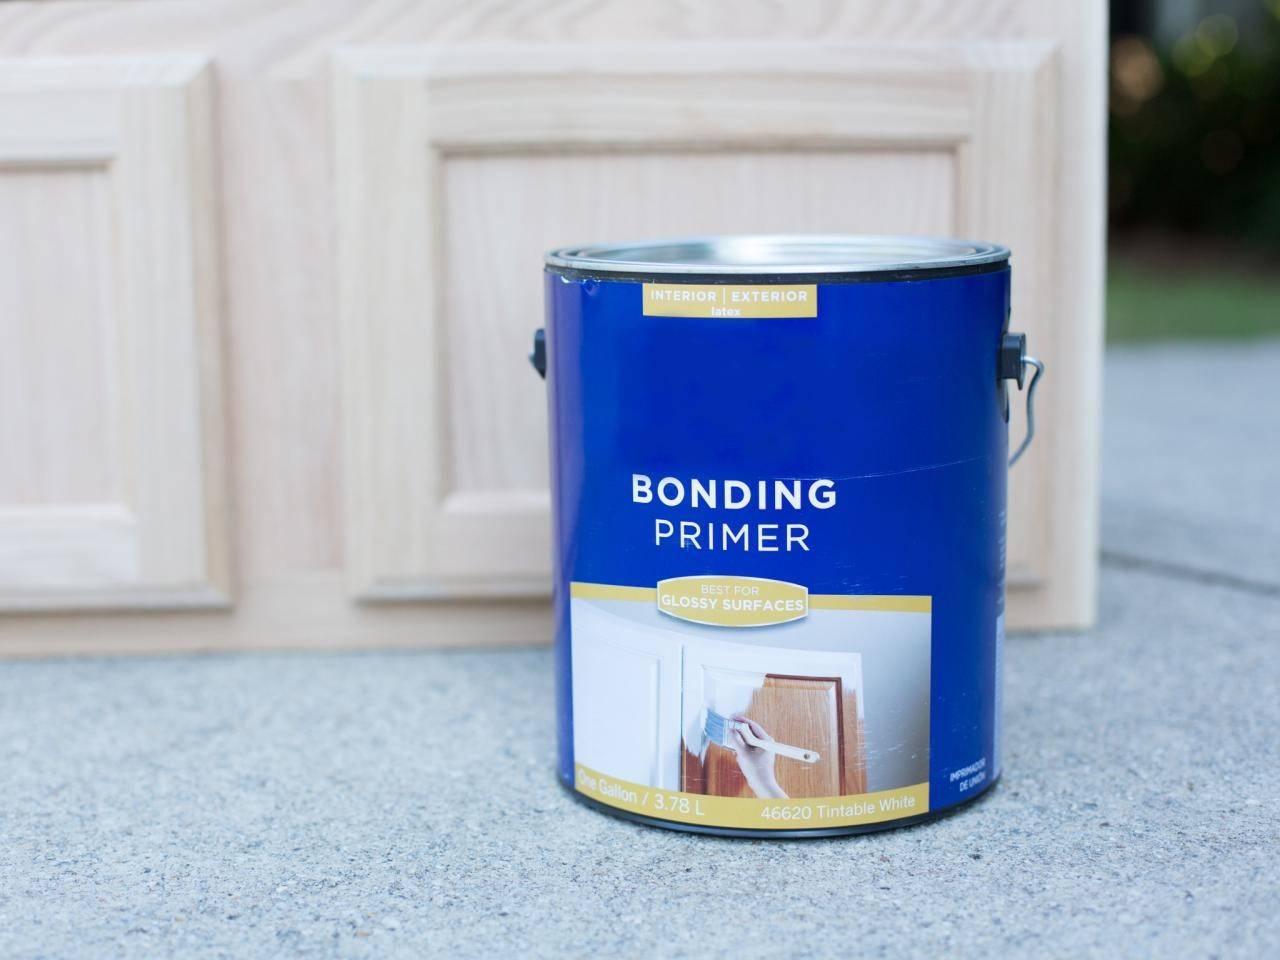 Best Bonding Primer Kitchen Cabinets - Get in The Trailer